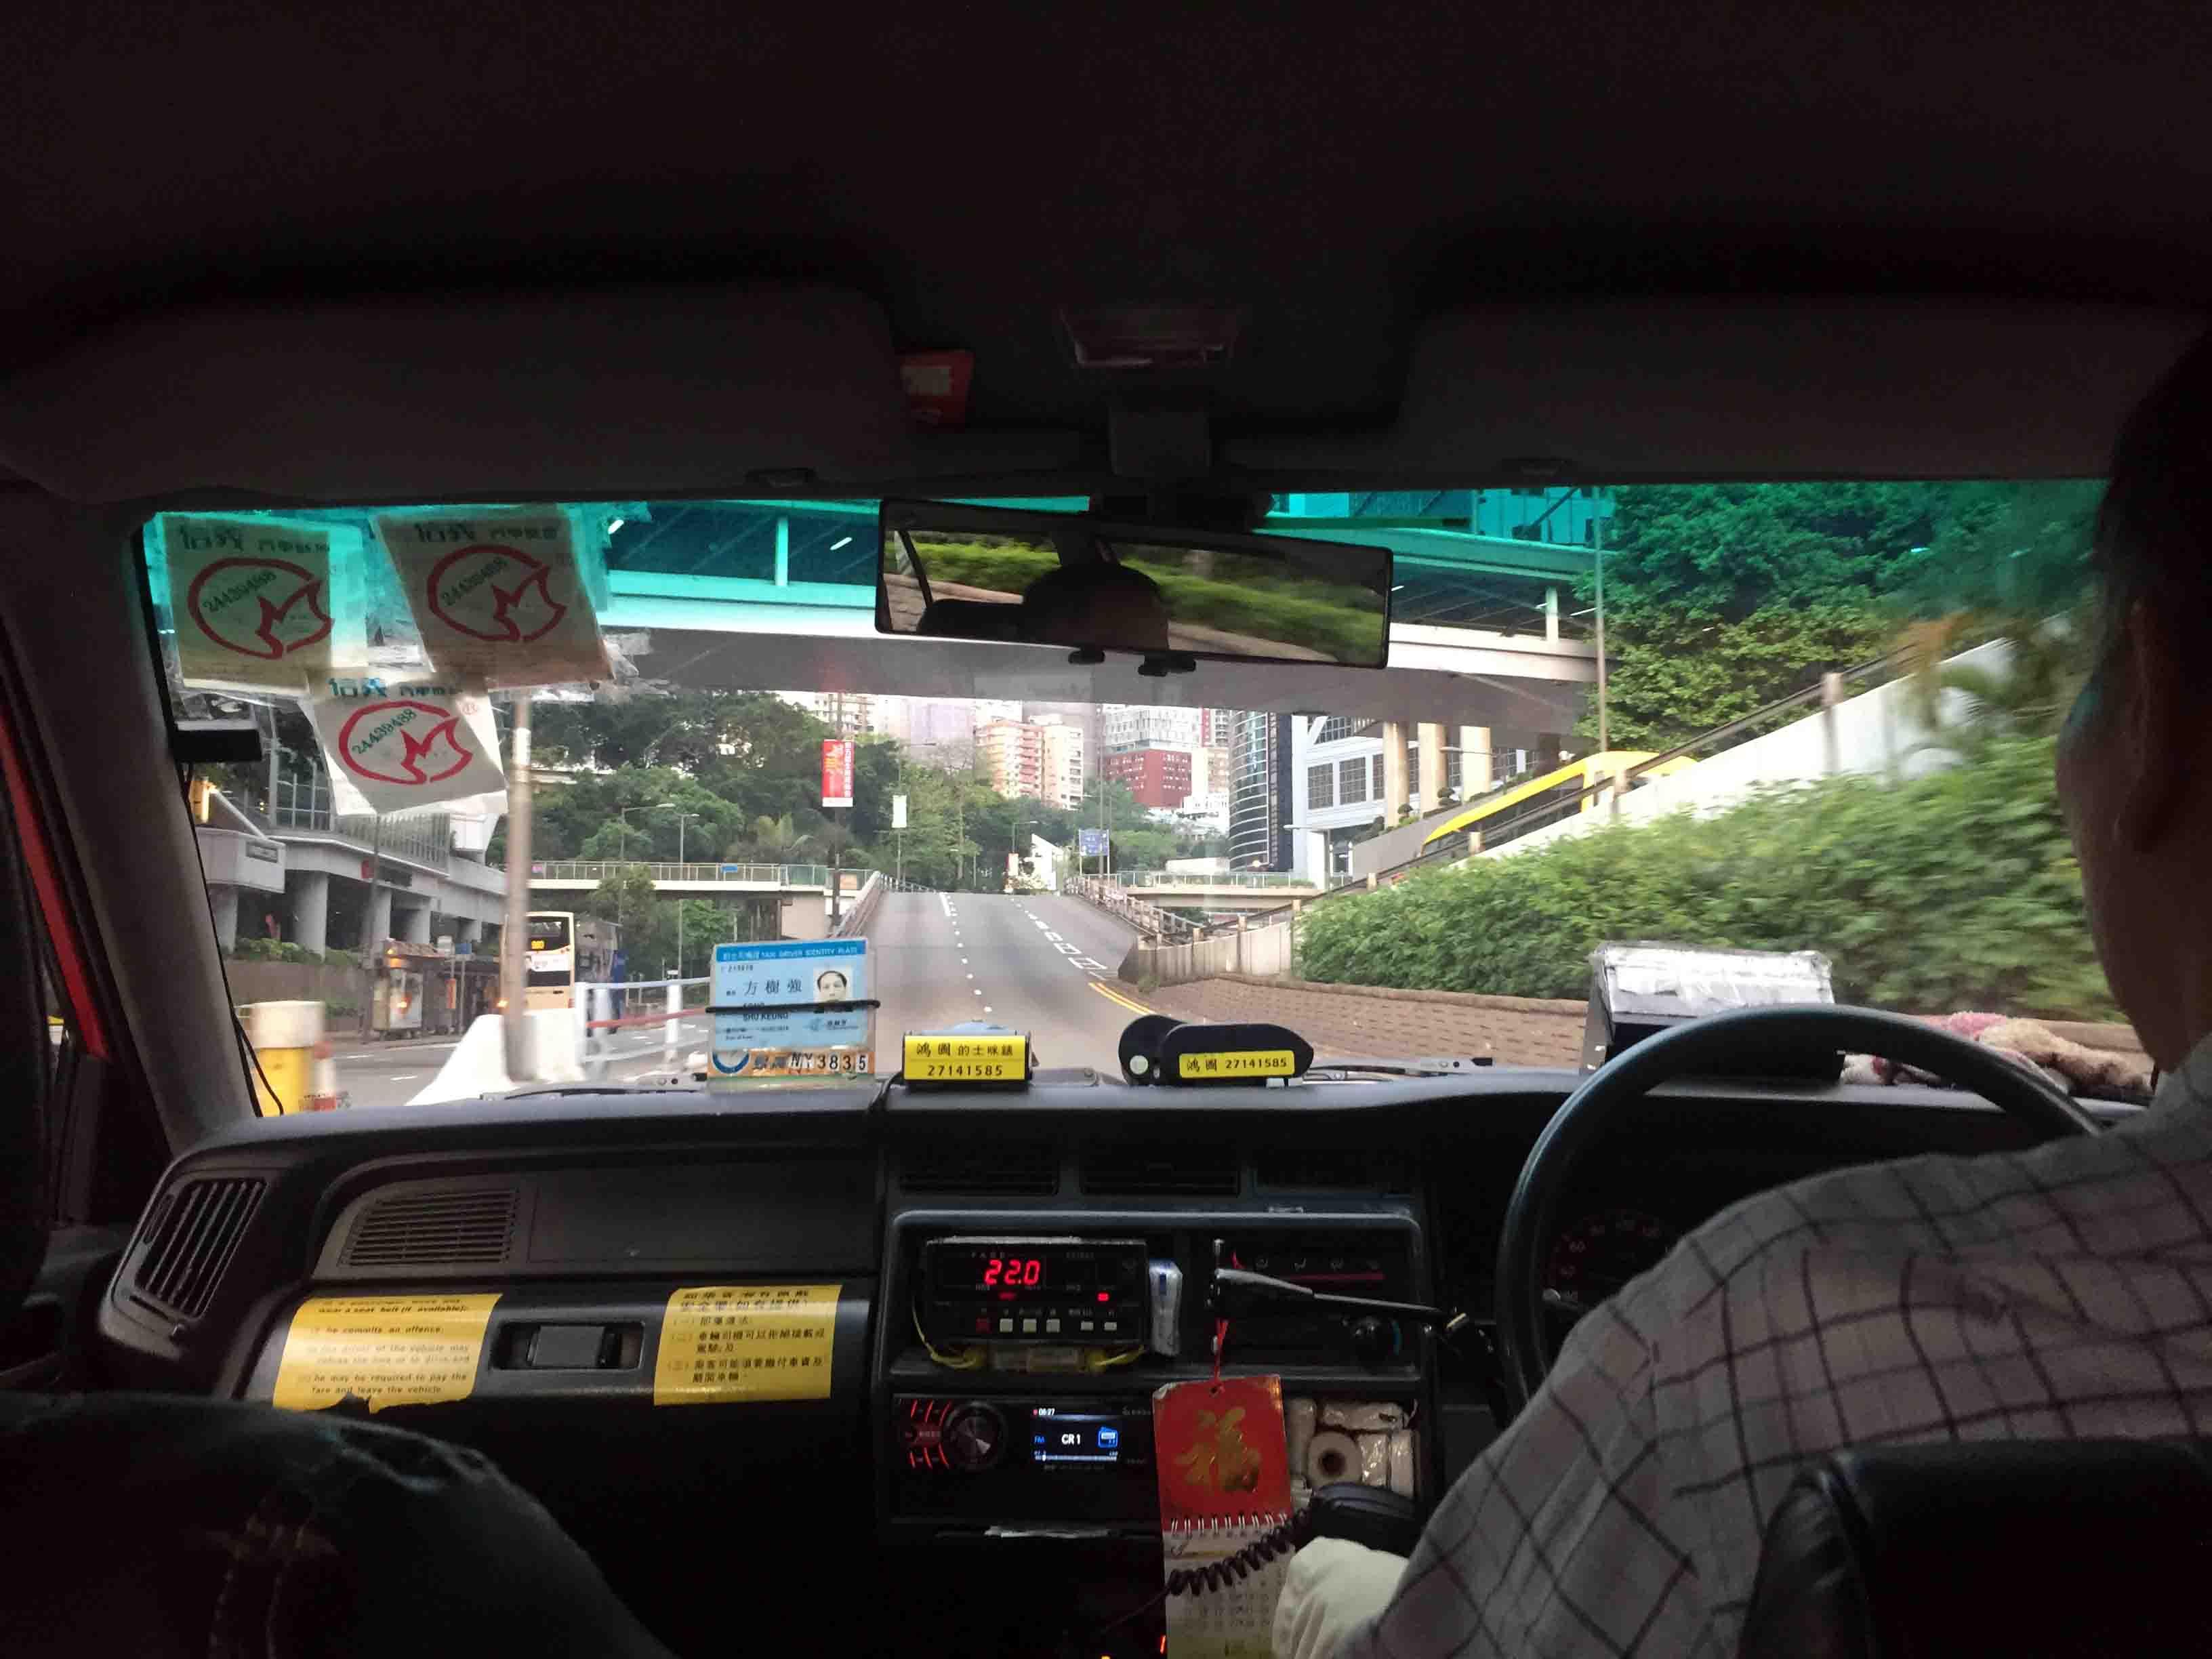 taxi-cabs-hong-kong